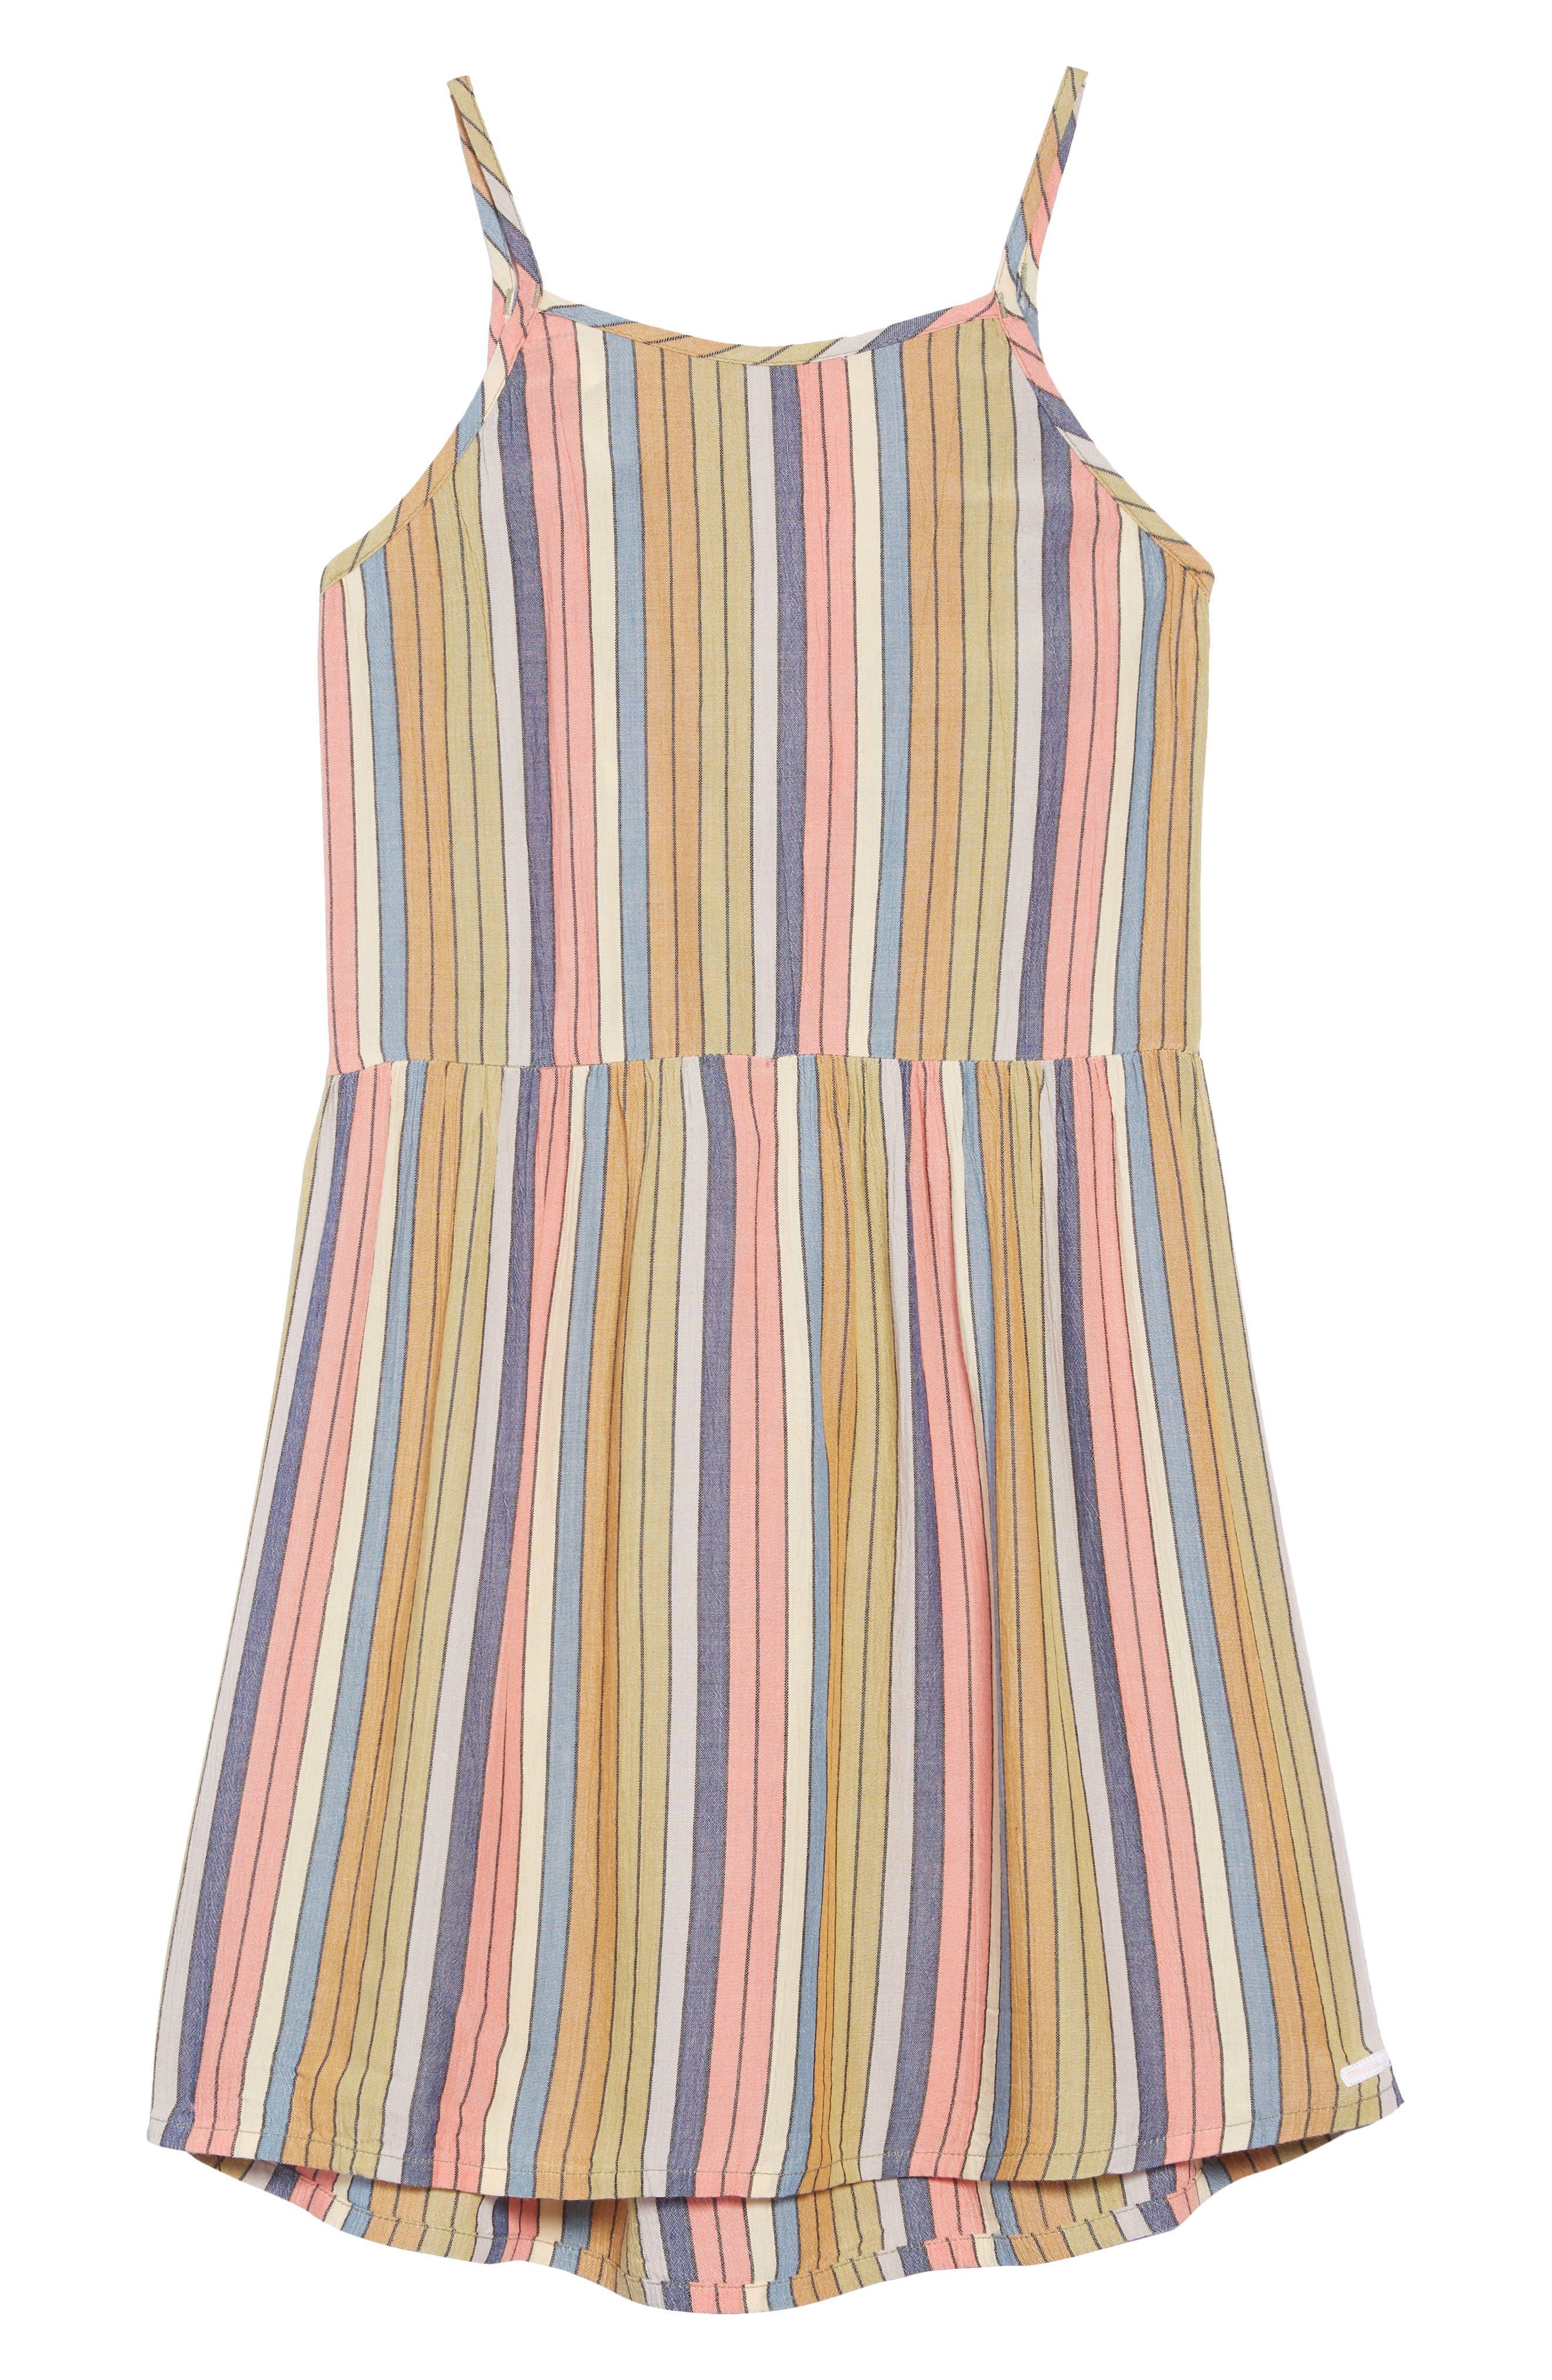 O'NEILL, Berlin Stripe Sundress, Main thumbnail 1, color, 994